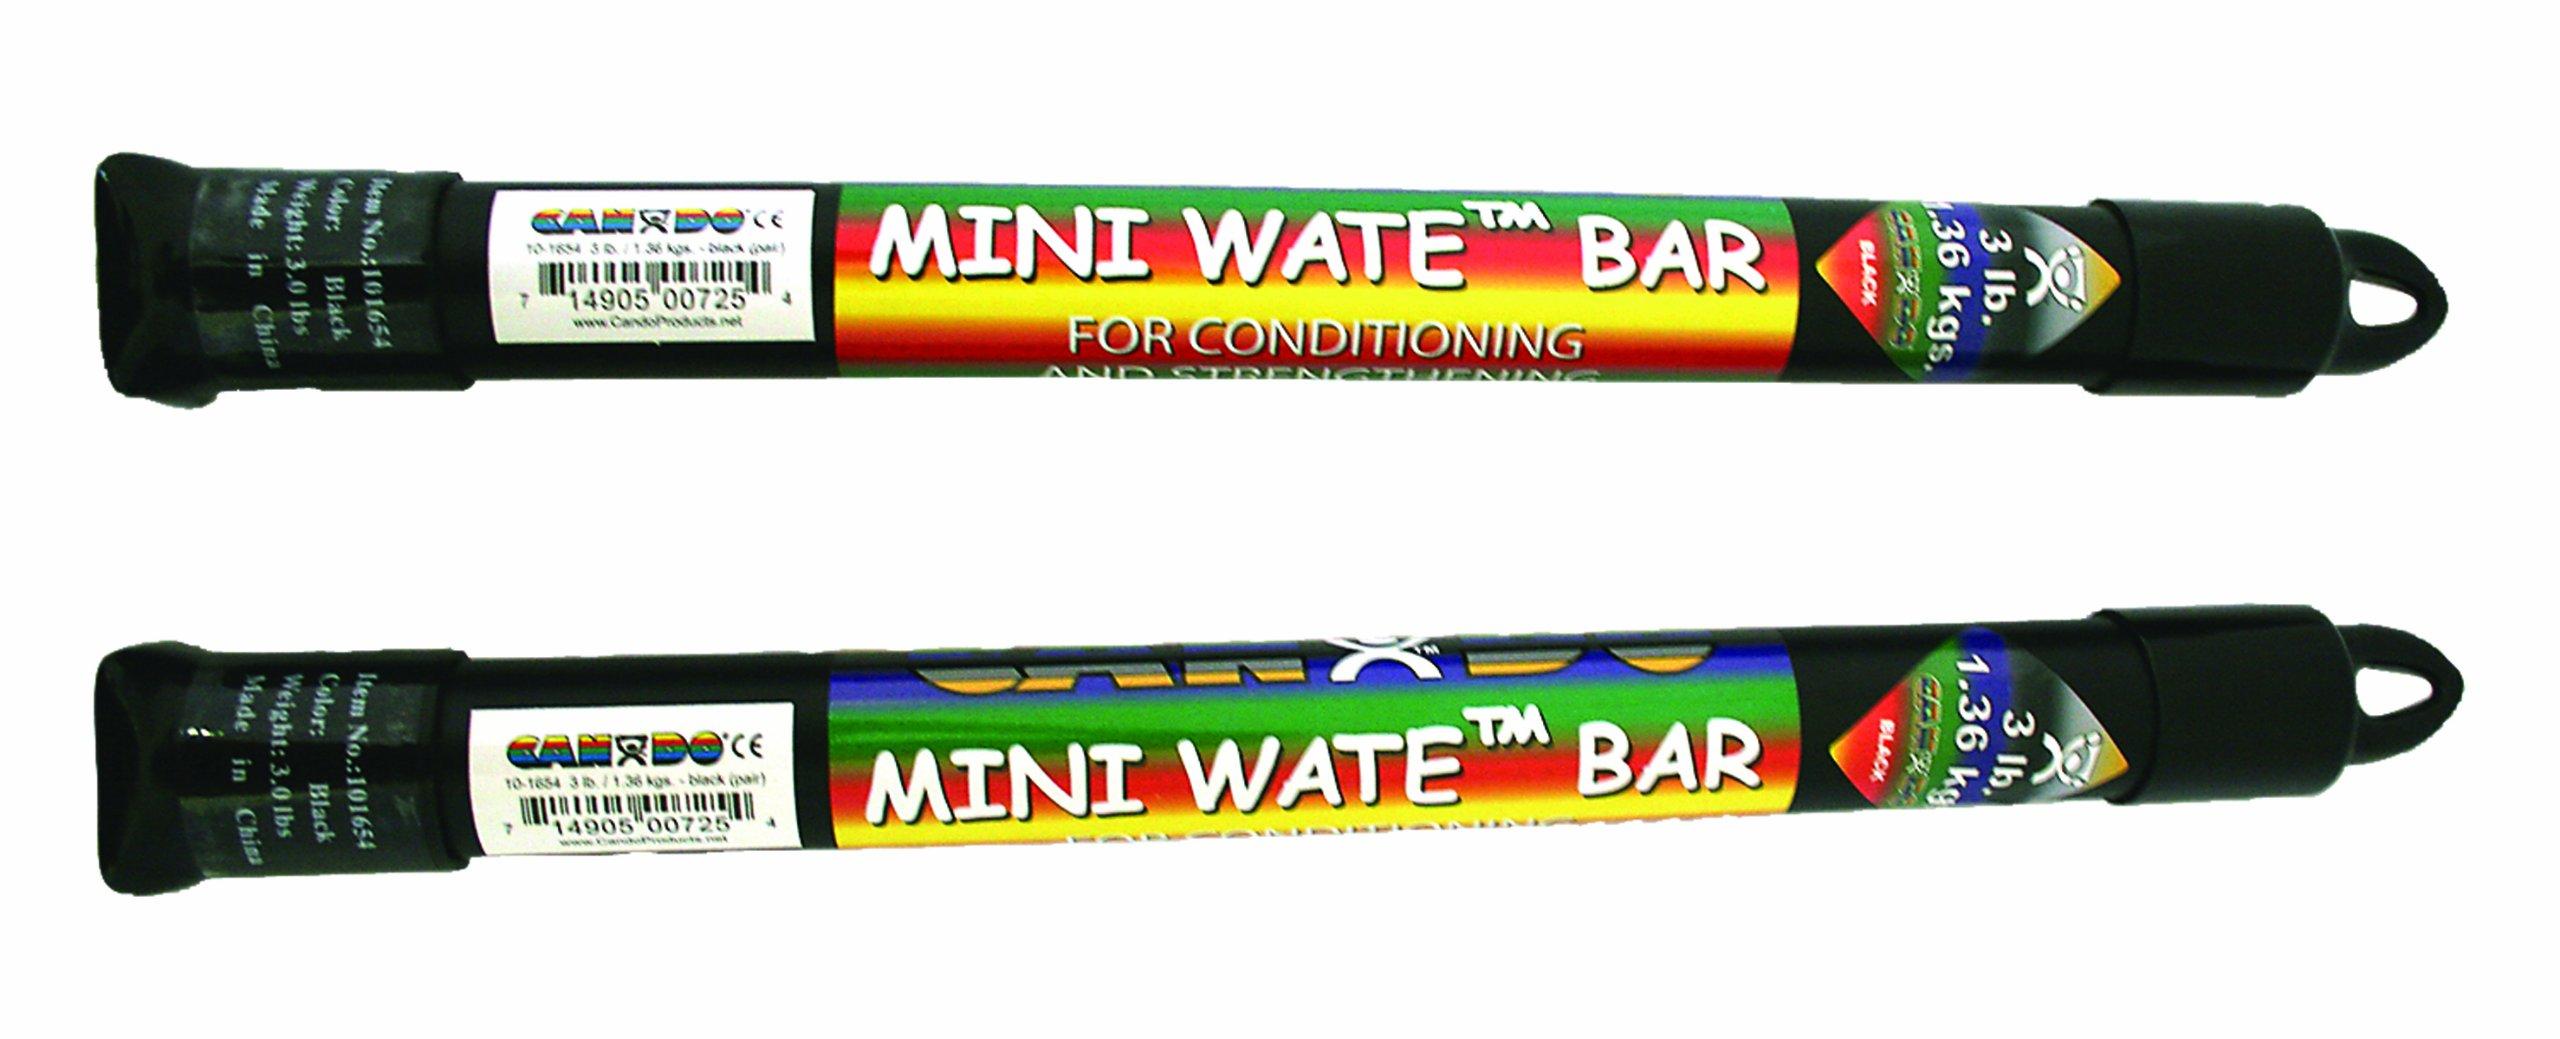 Cando 10-1654 Mini Wate Bar Pair, 14'' Length, 3 lbs Weight